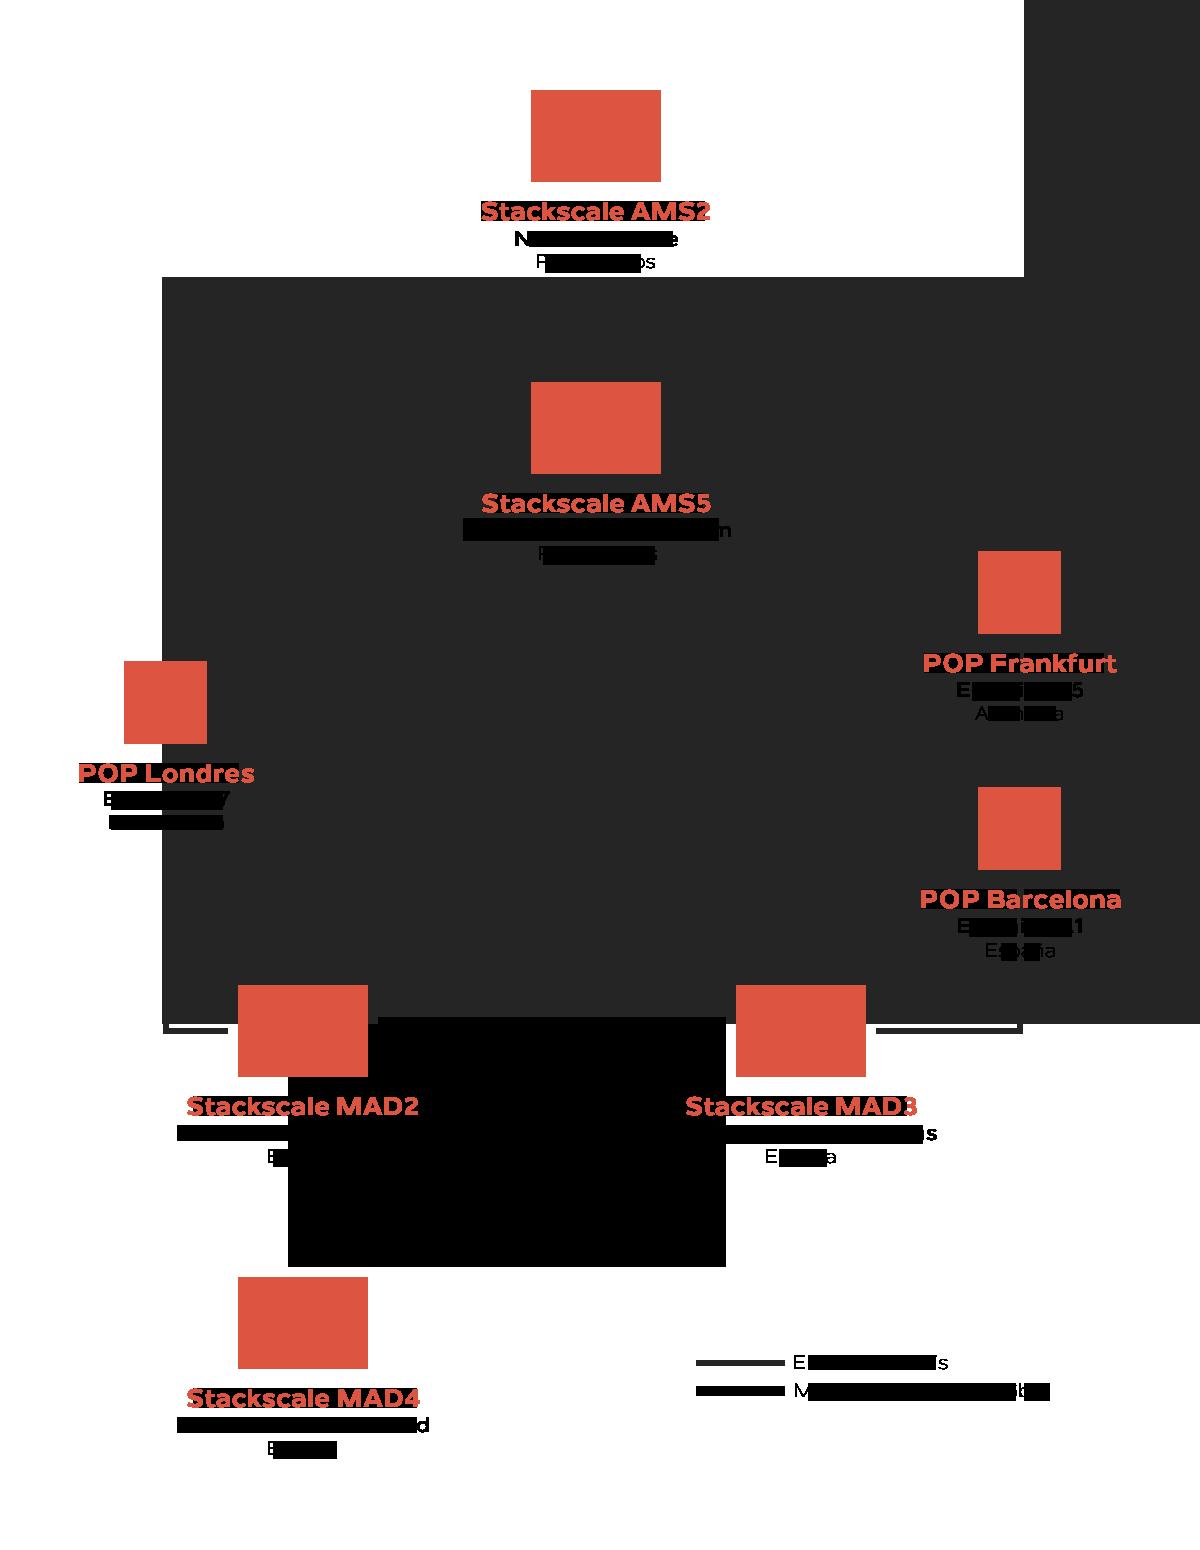 Red de centros de datos de Stackscale